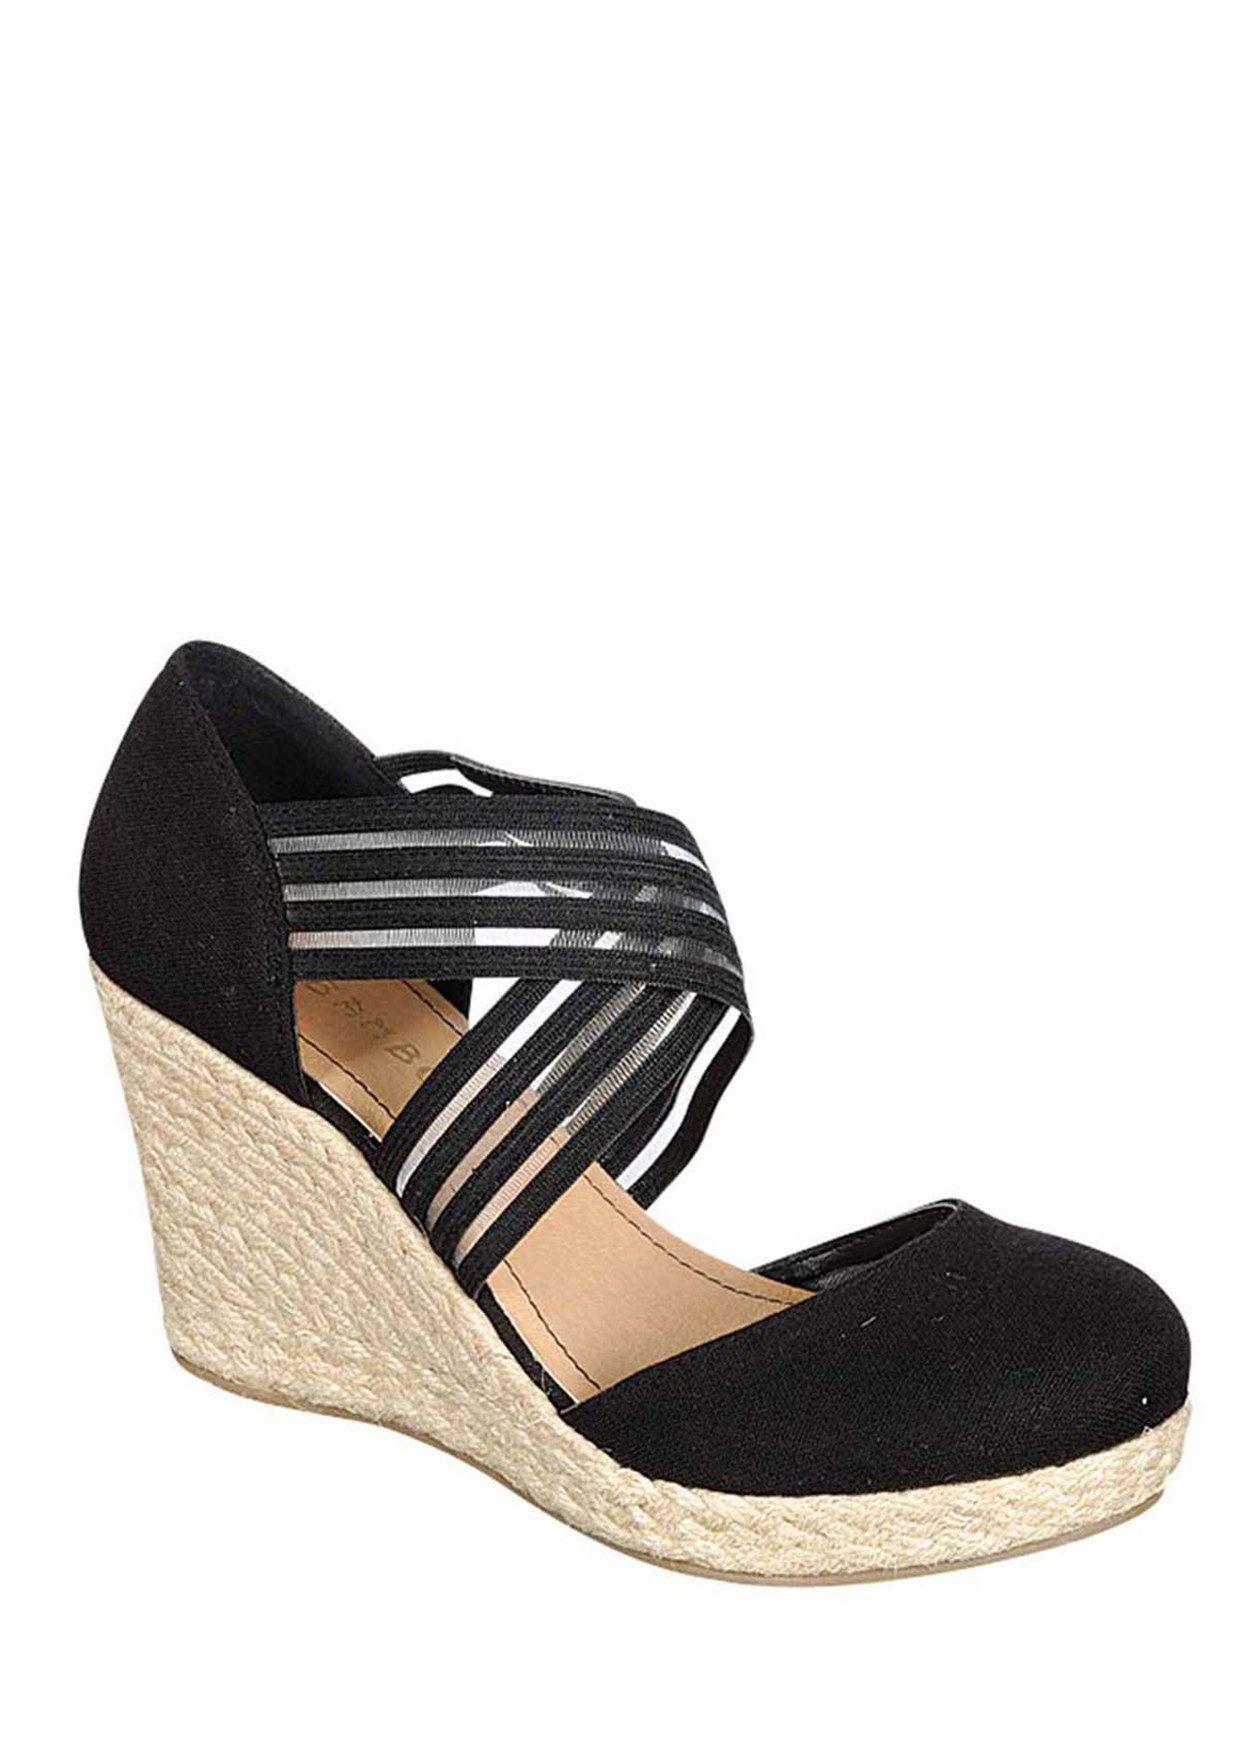 896ceaa6d43 ideeli | BAMBOO Tessa-02 | shoes | Espadrilles, Shoes, Wedges